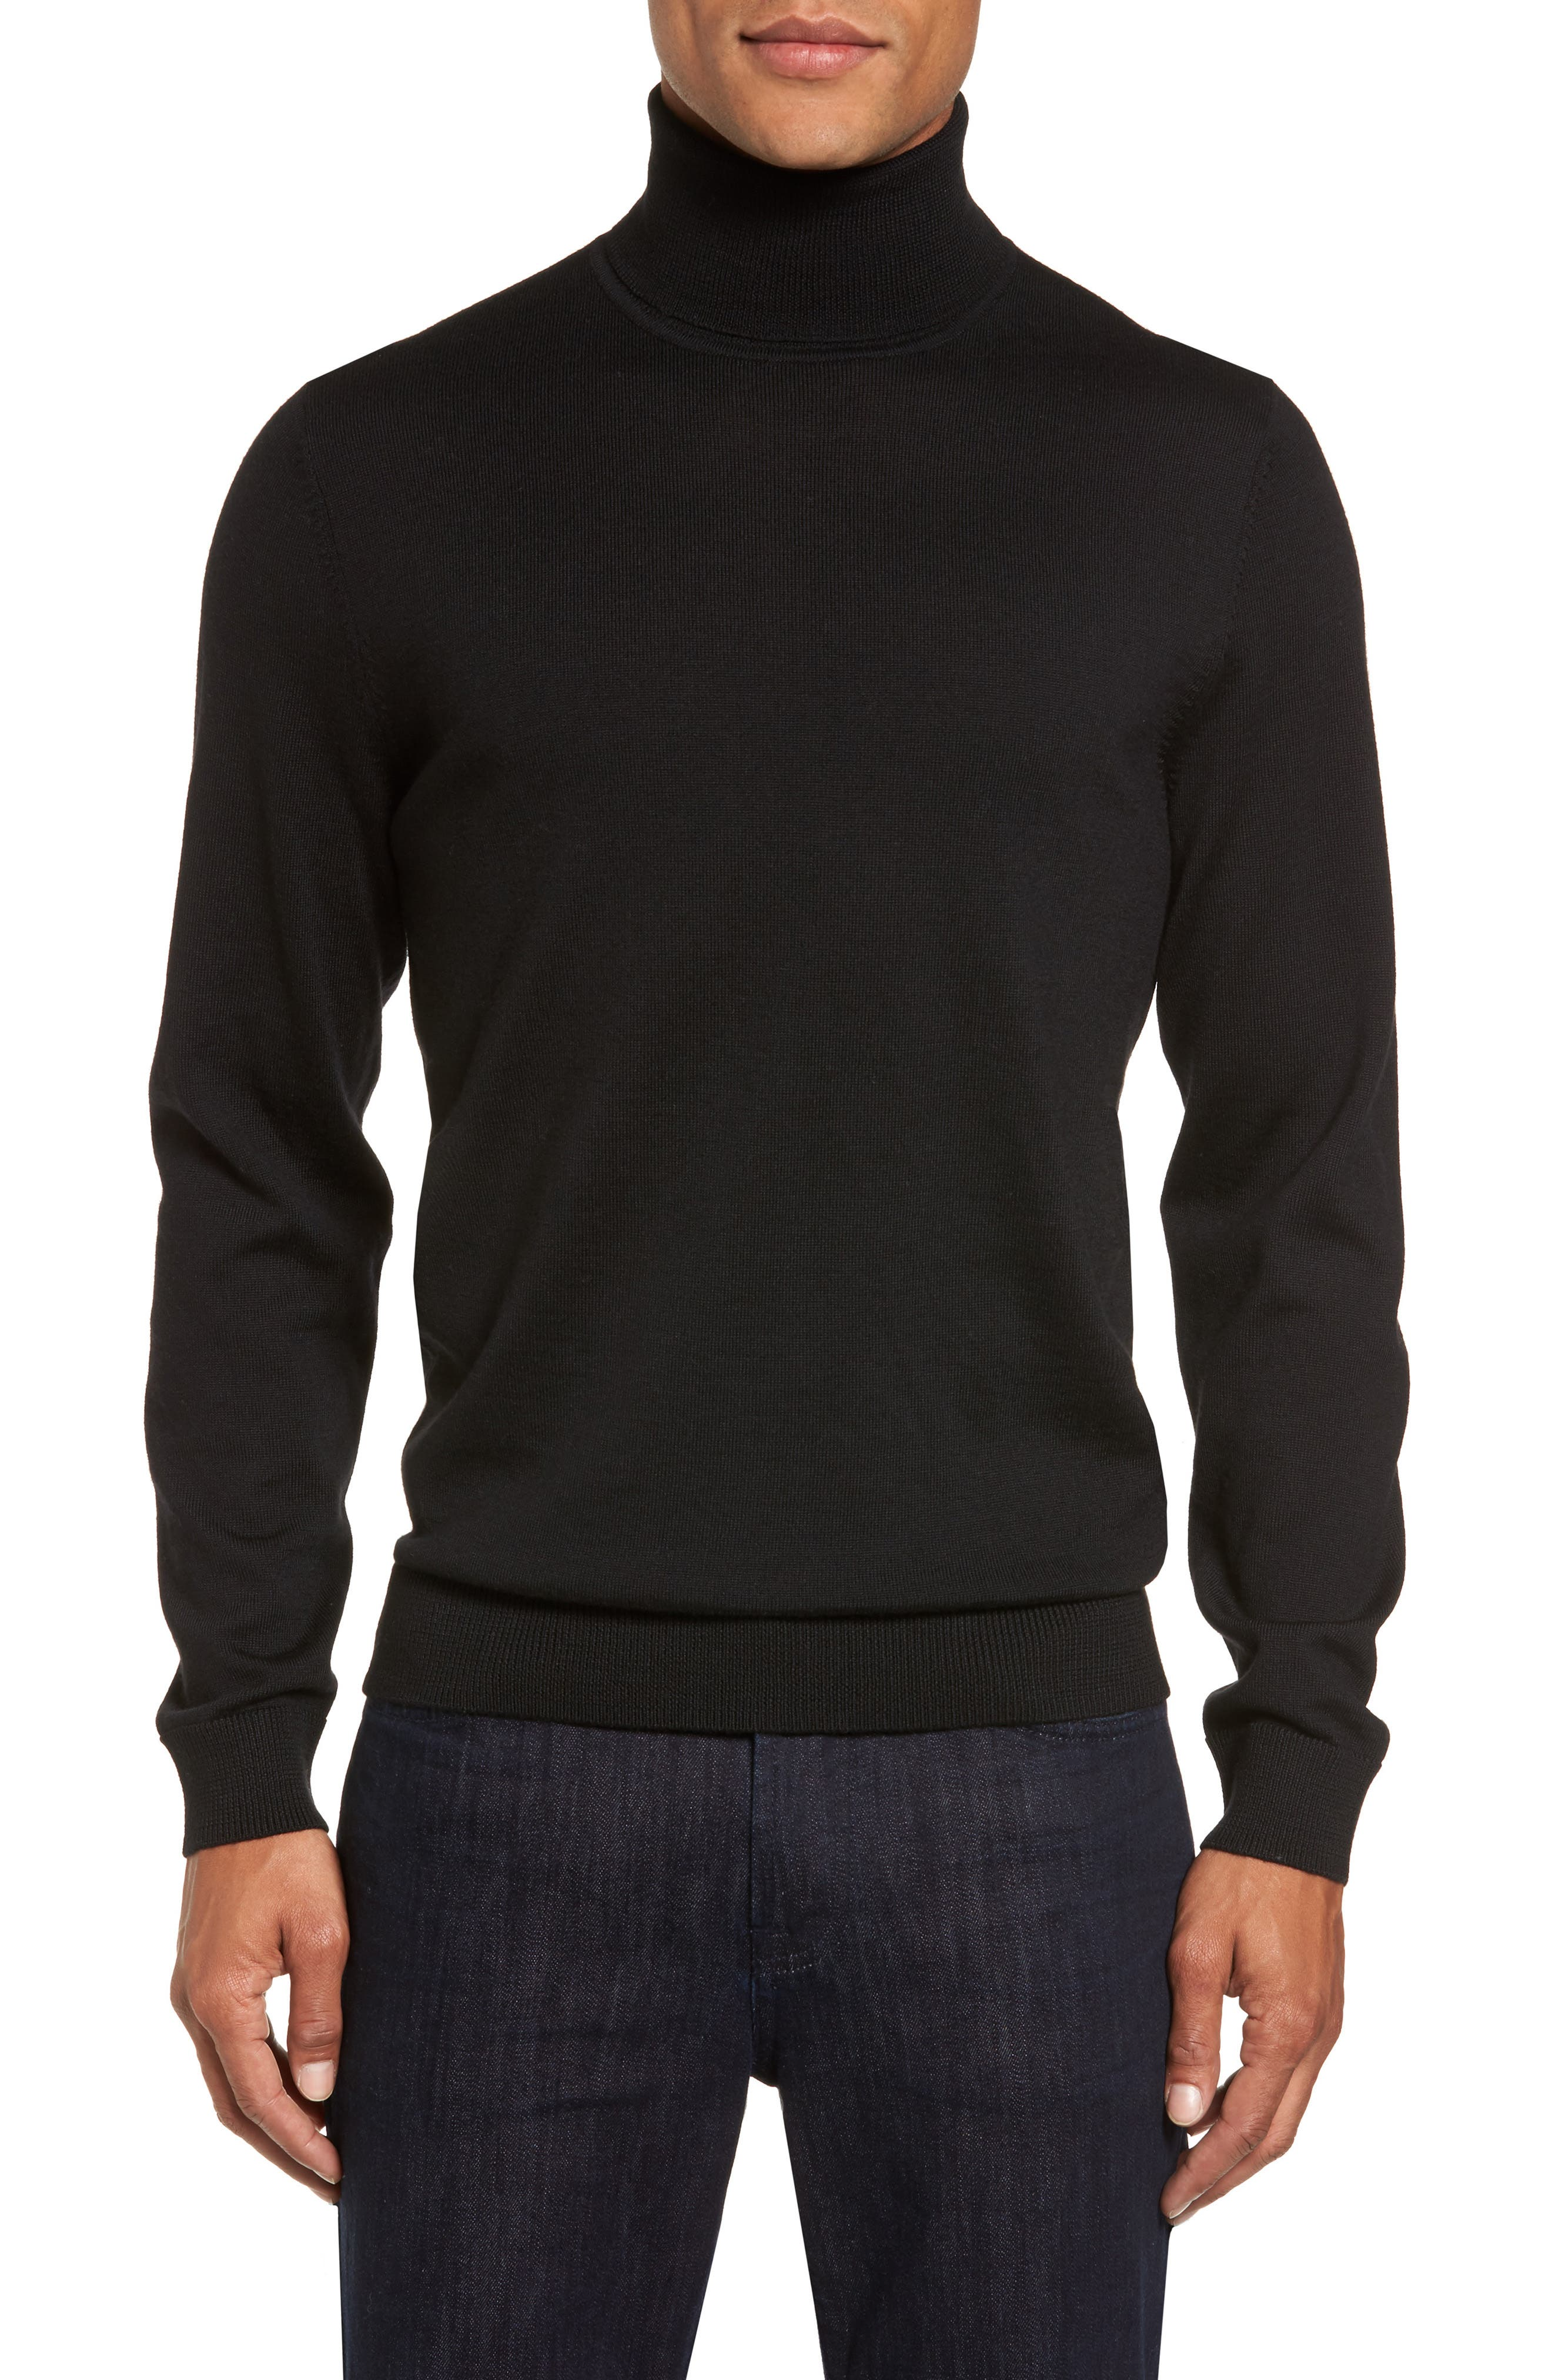 Nordstrom Shop Merino Wool Turtleneck Sweater, Black